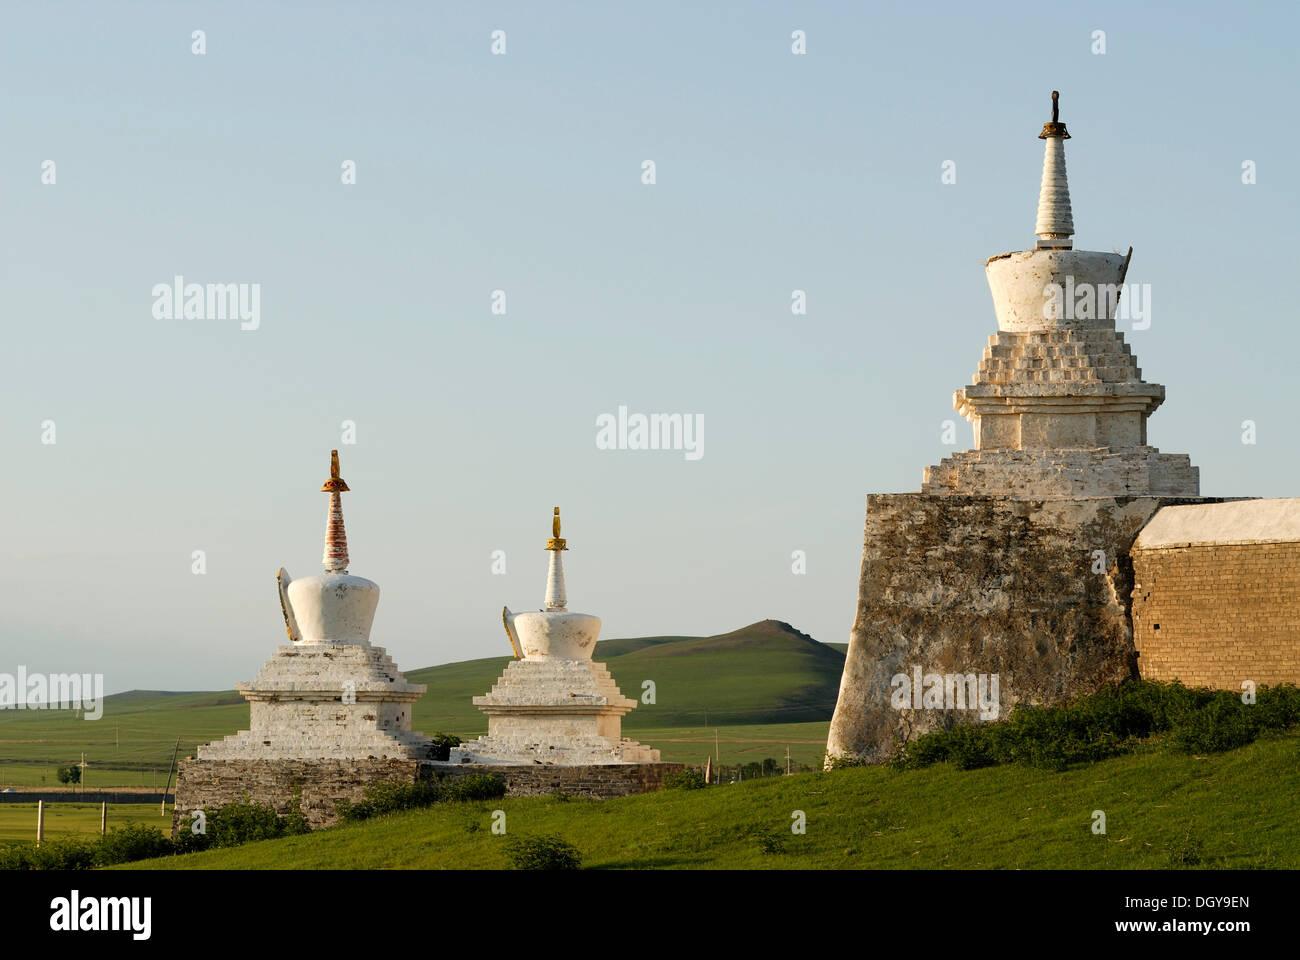 Stupa of the outer wall of the Erdene Zuu Khiid Monastery, Karakorum, Kharkhorin, Oevoerkhangai province, Mongolia, Asia - Stock Image